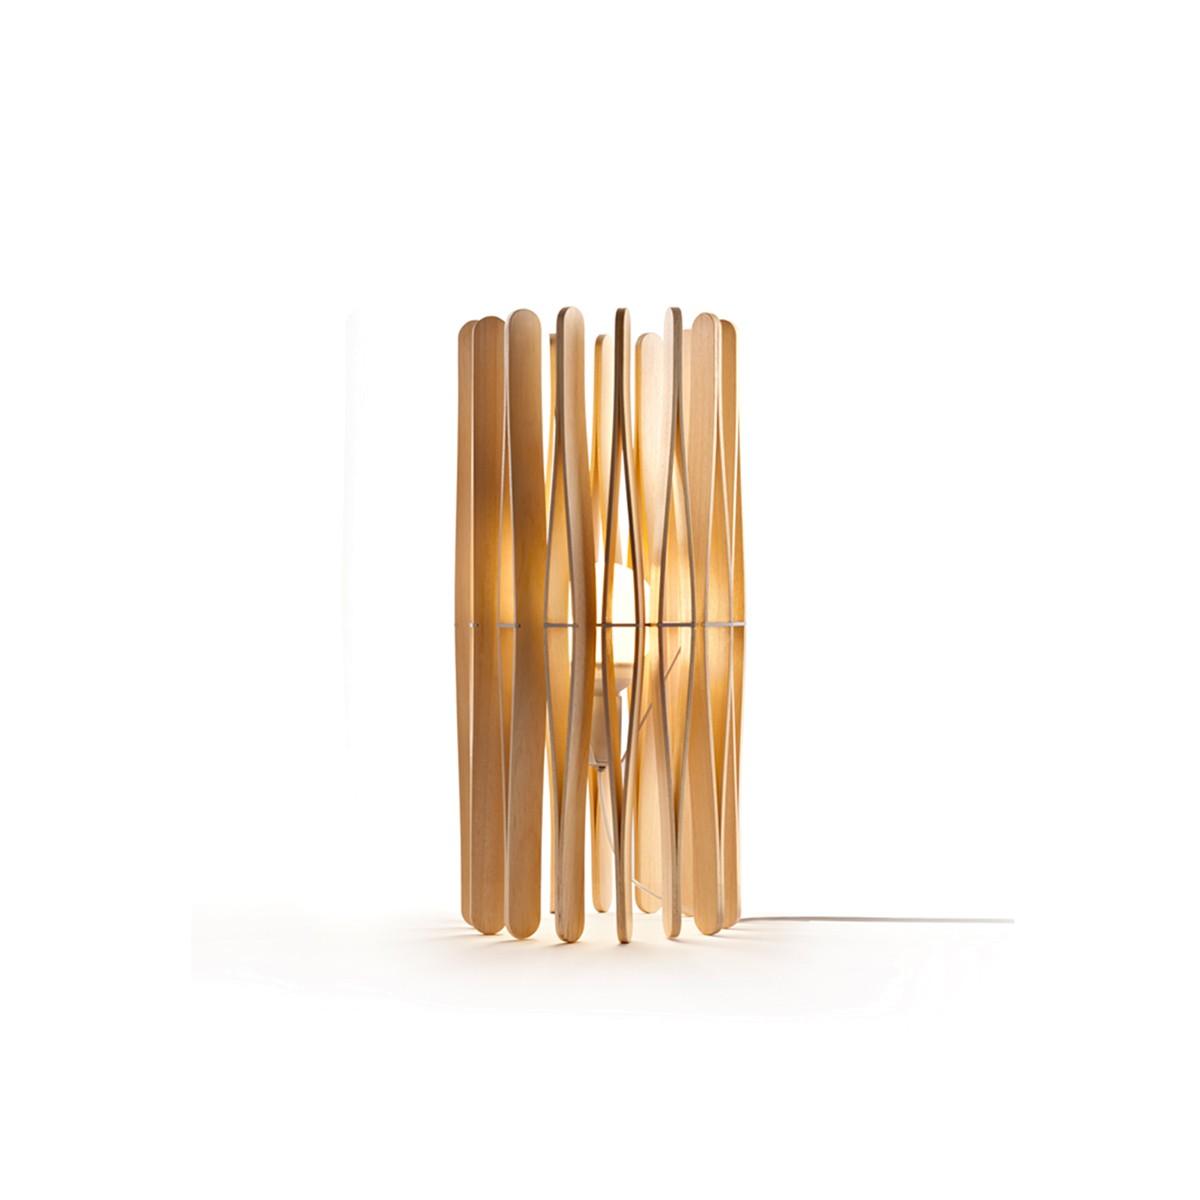 Fabbian Stick Tischleuchte LED (E27), Holz